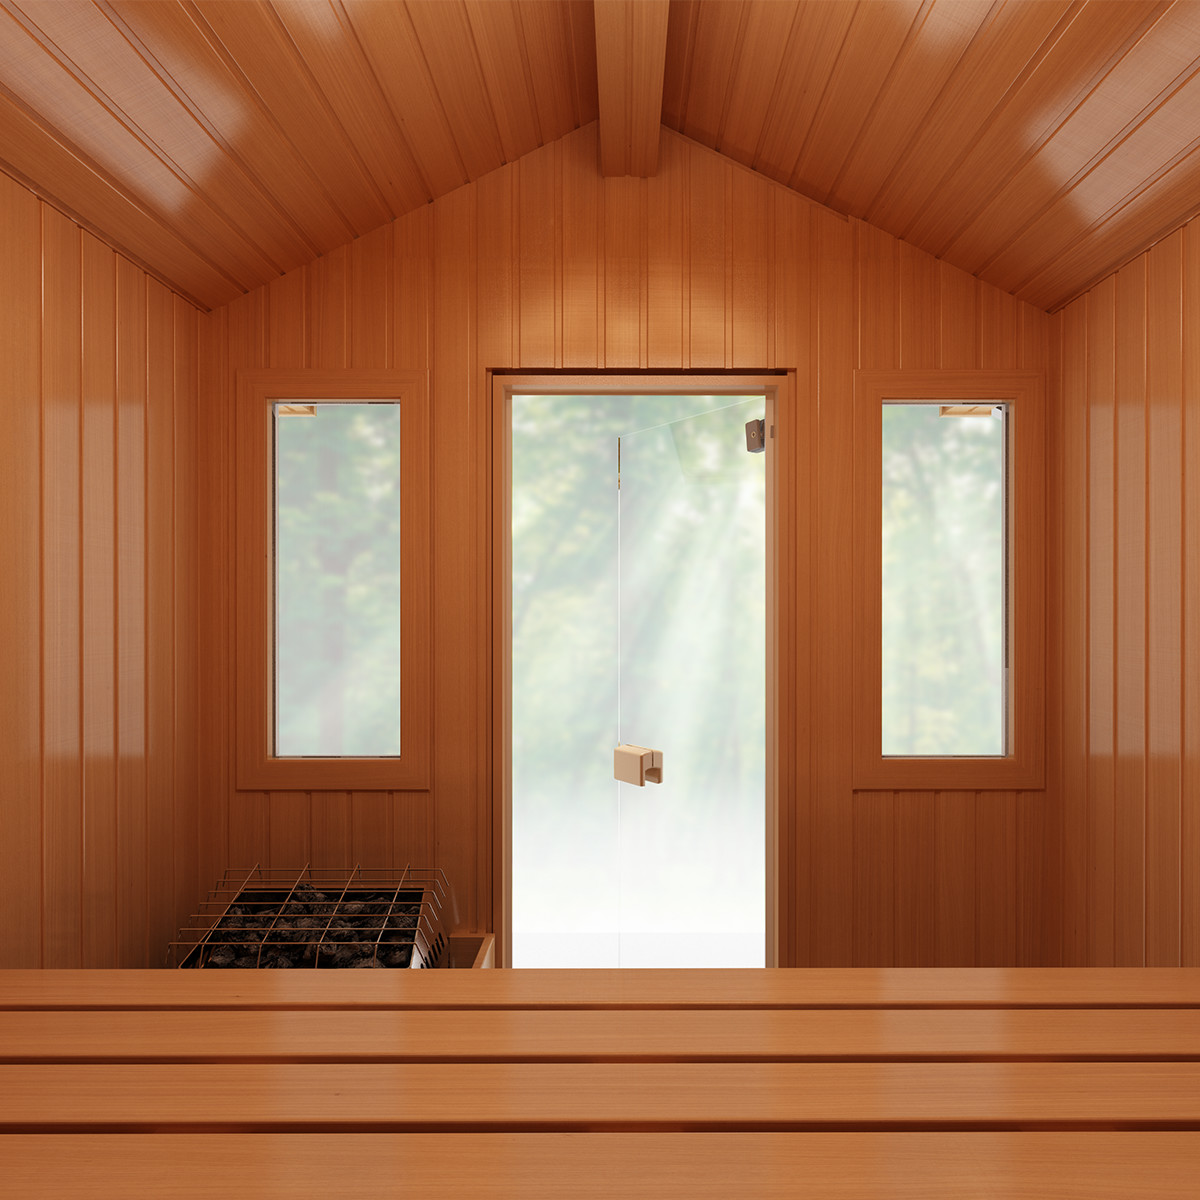 Finnleo Terrace Outdoor Sauna Inside